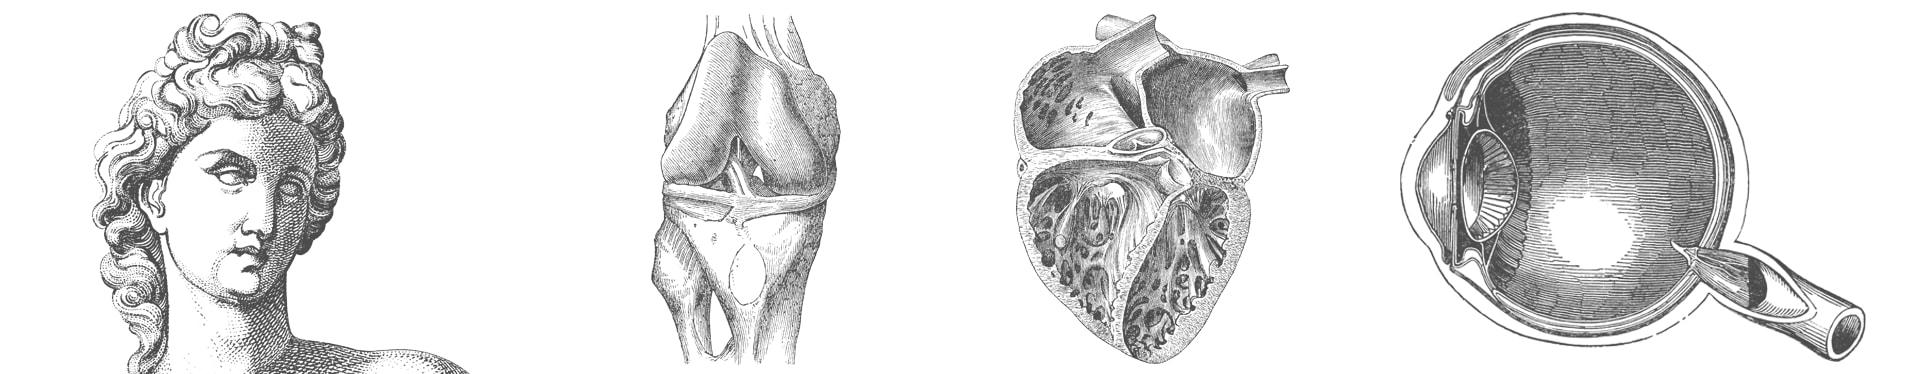 ilustraciones laboratorio i+med ideolab